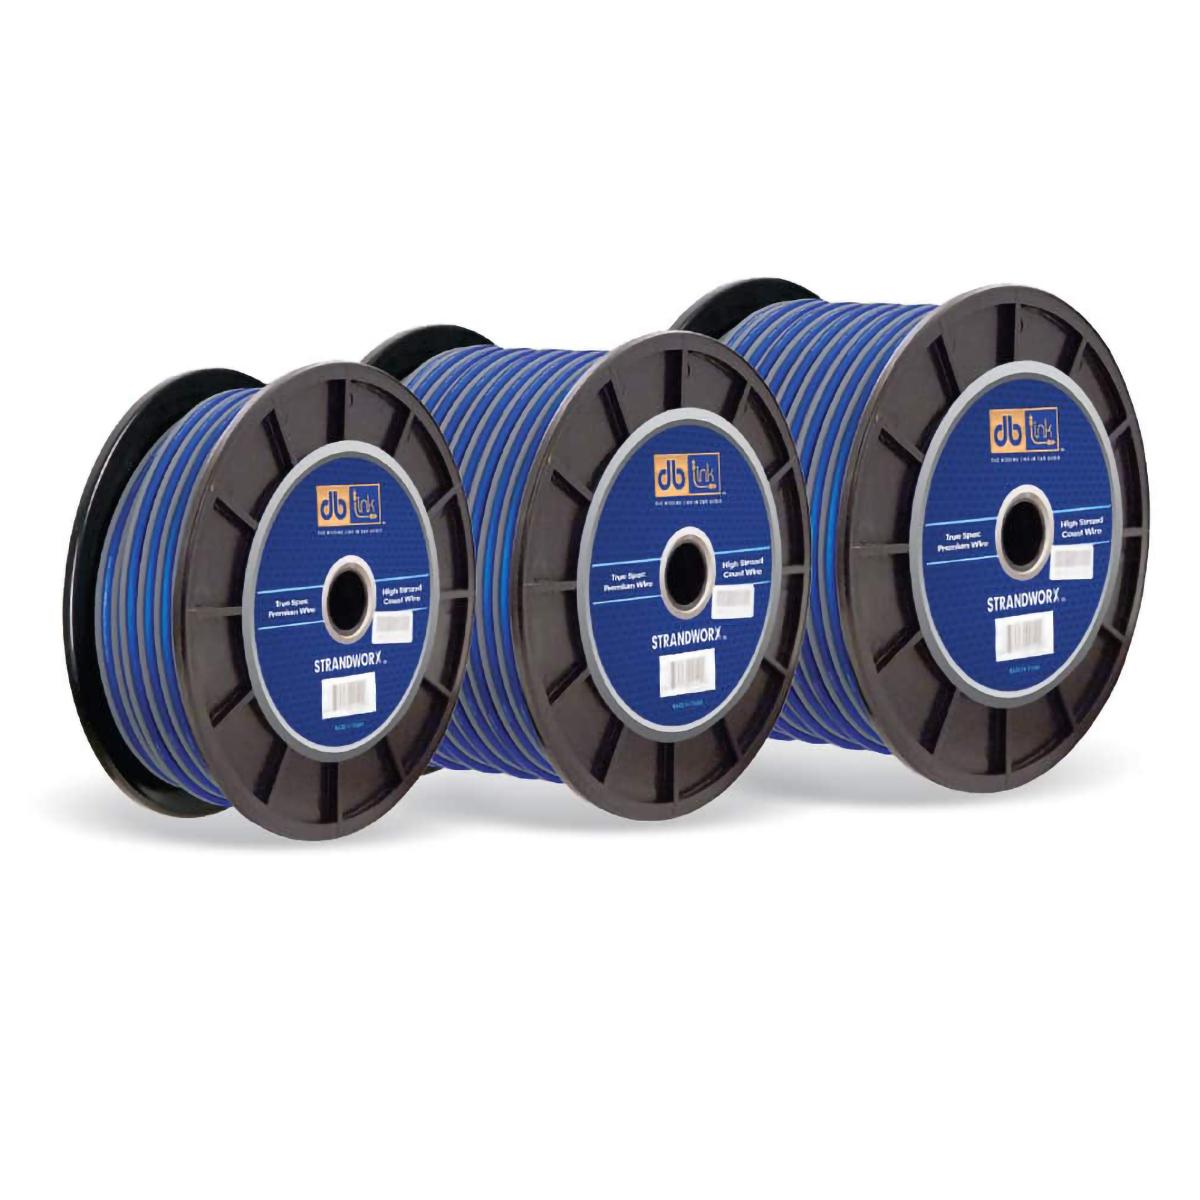 10GA BLUE 100FT STRANDWORX SPKR WIRE